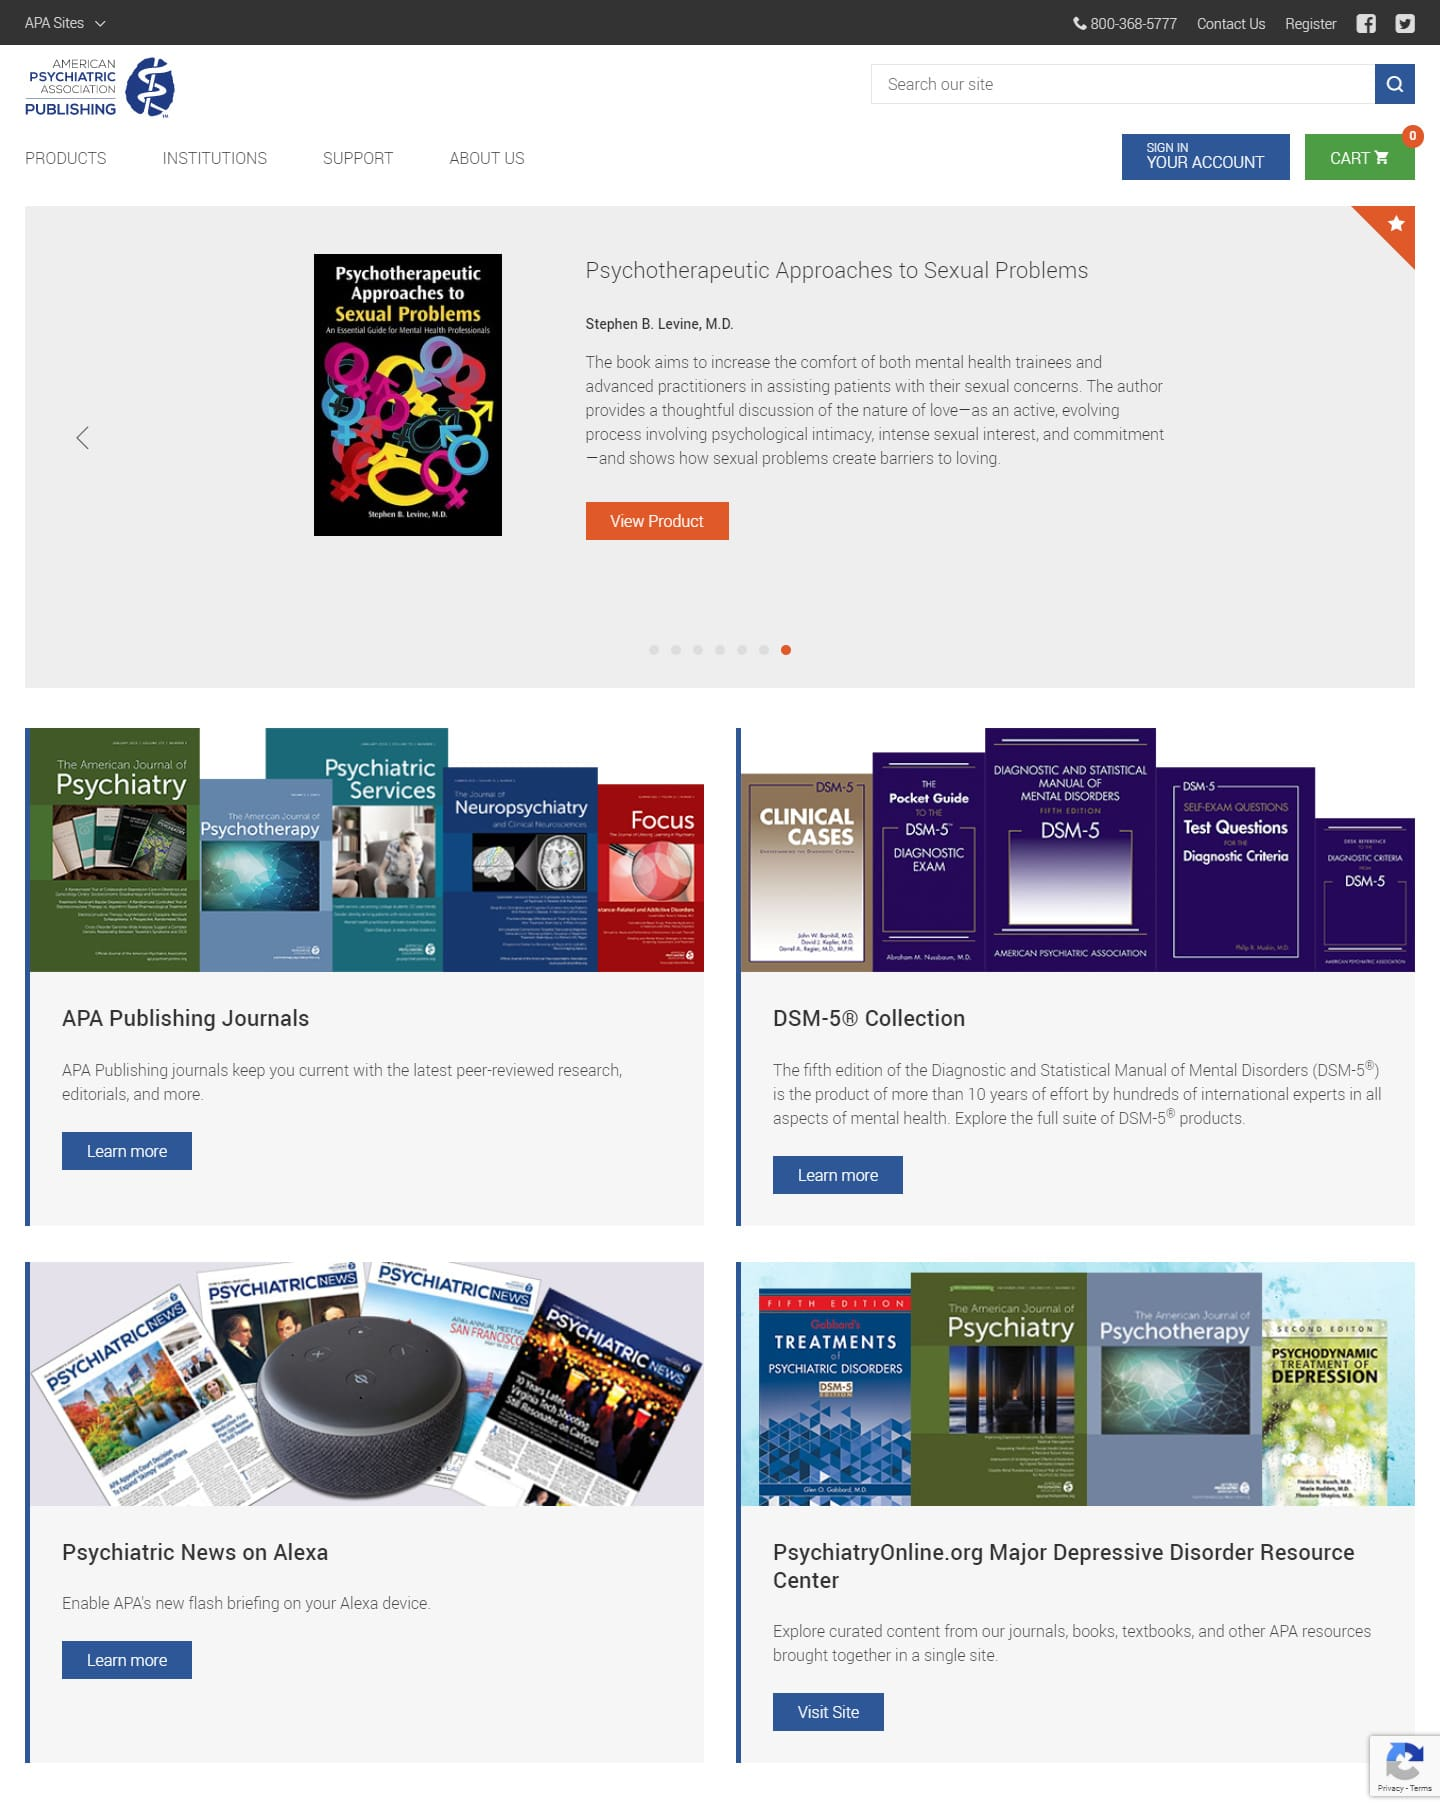 The American Psychiatric Association Publishing (APAP) - website screenshot